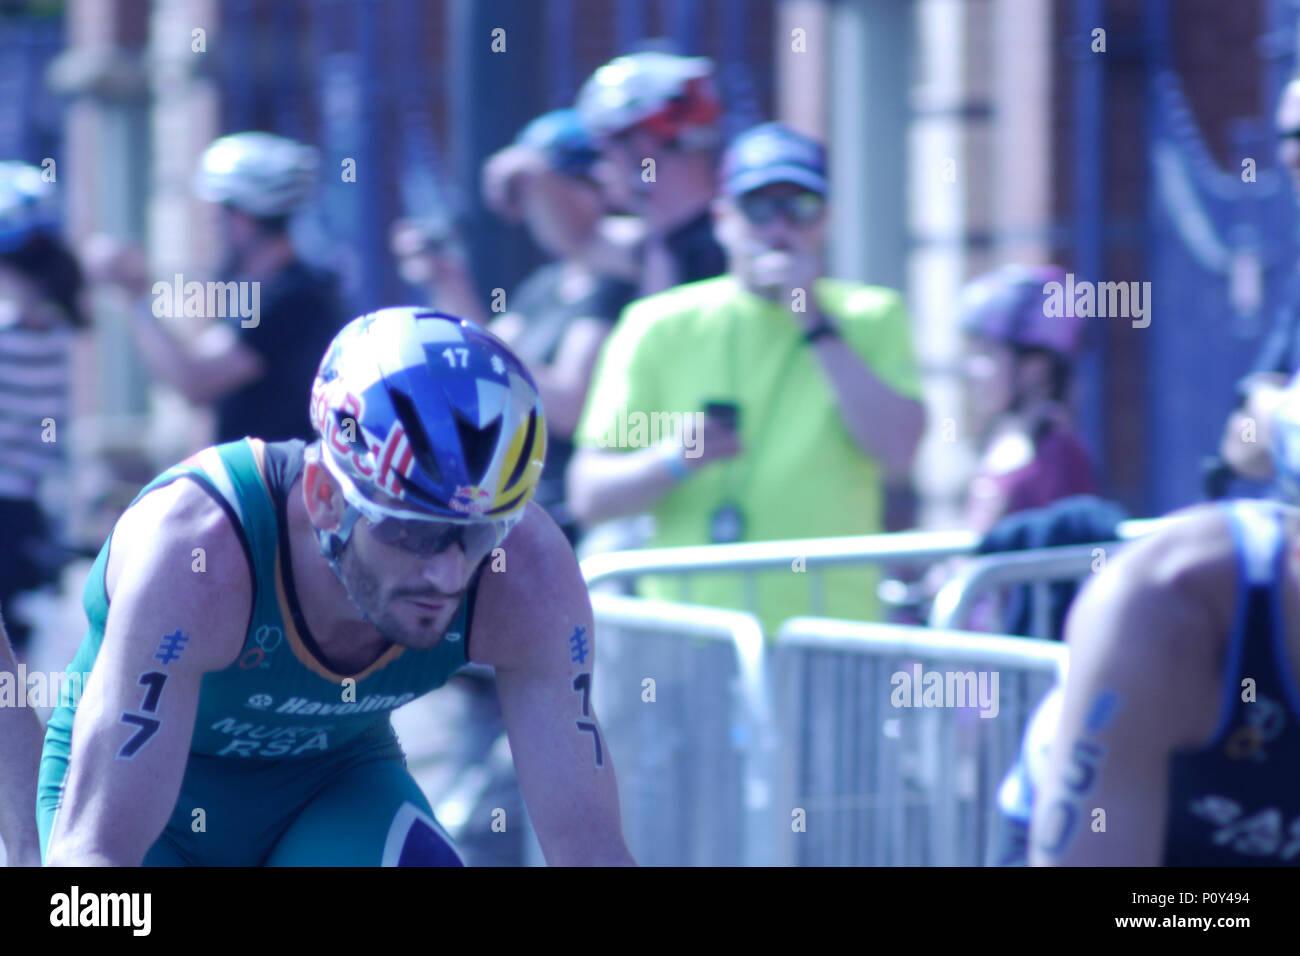 Leeds, UK, 10th June 2018. Richard Murray, Number 17, of RSA, during the cycle, on his way to winning the ITU World Triathlon Leeds. Credit: Jonathan Sedgwick/ Alamy Live News. - Stock Image